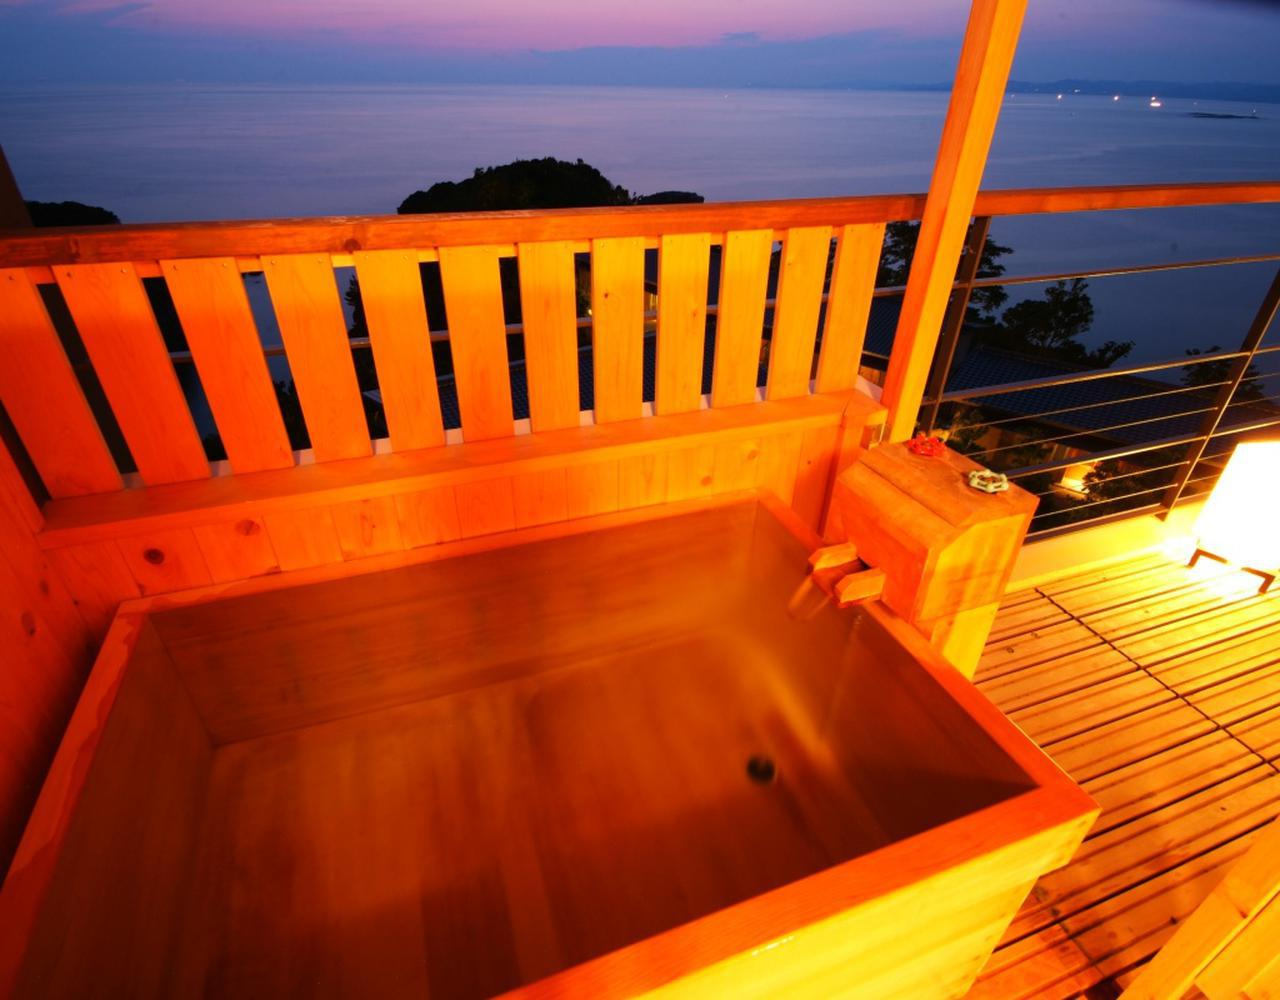 画像: 浜千鳥の湯 海舟 暁の抄 和洋室 客室露天風呂